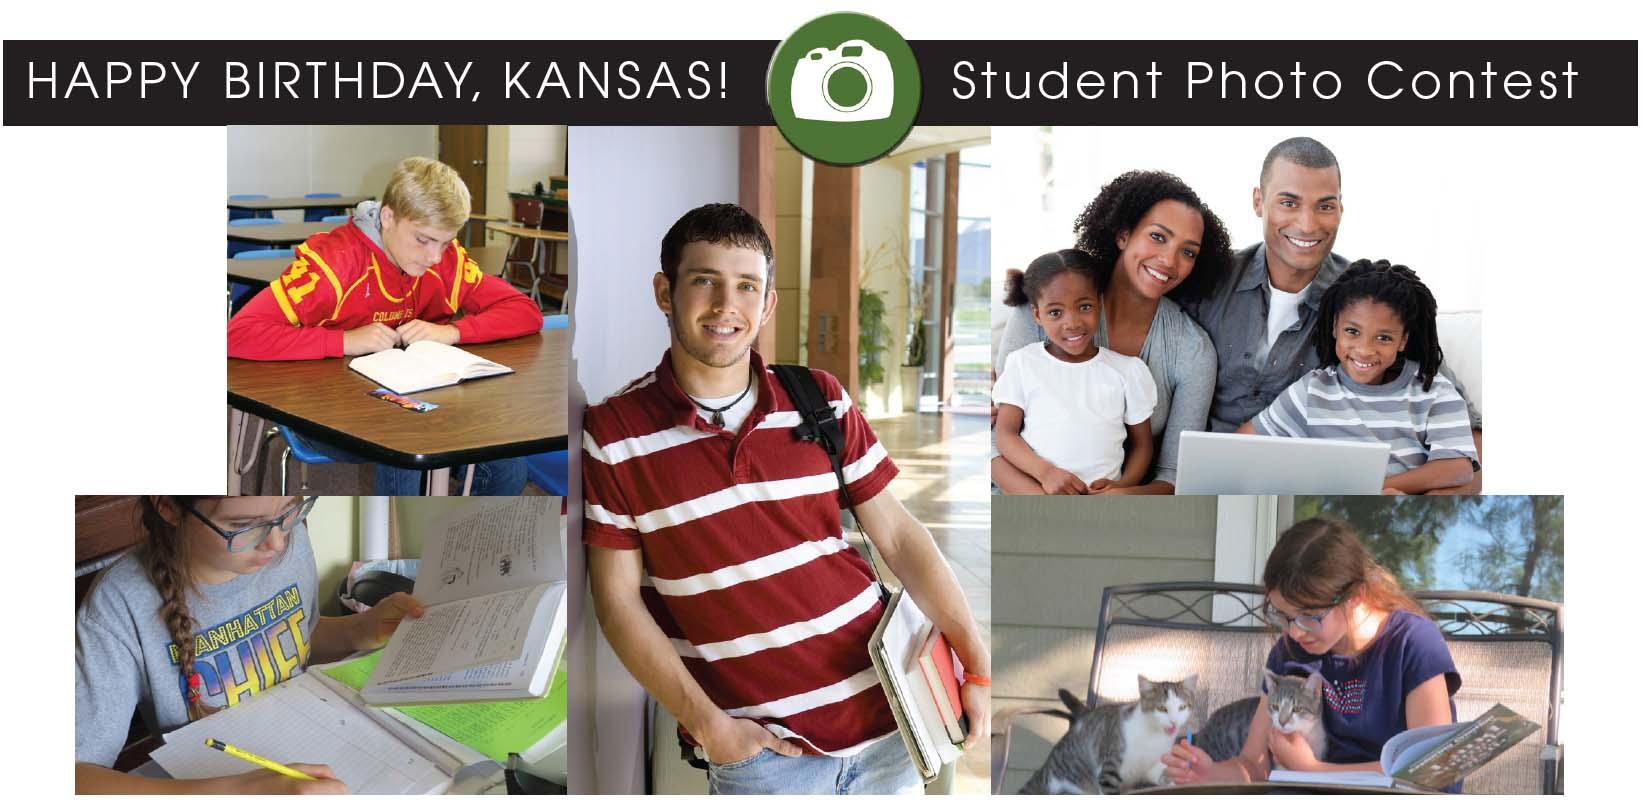 Happy Birthday, Kansas! student photo contest